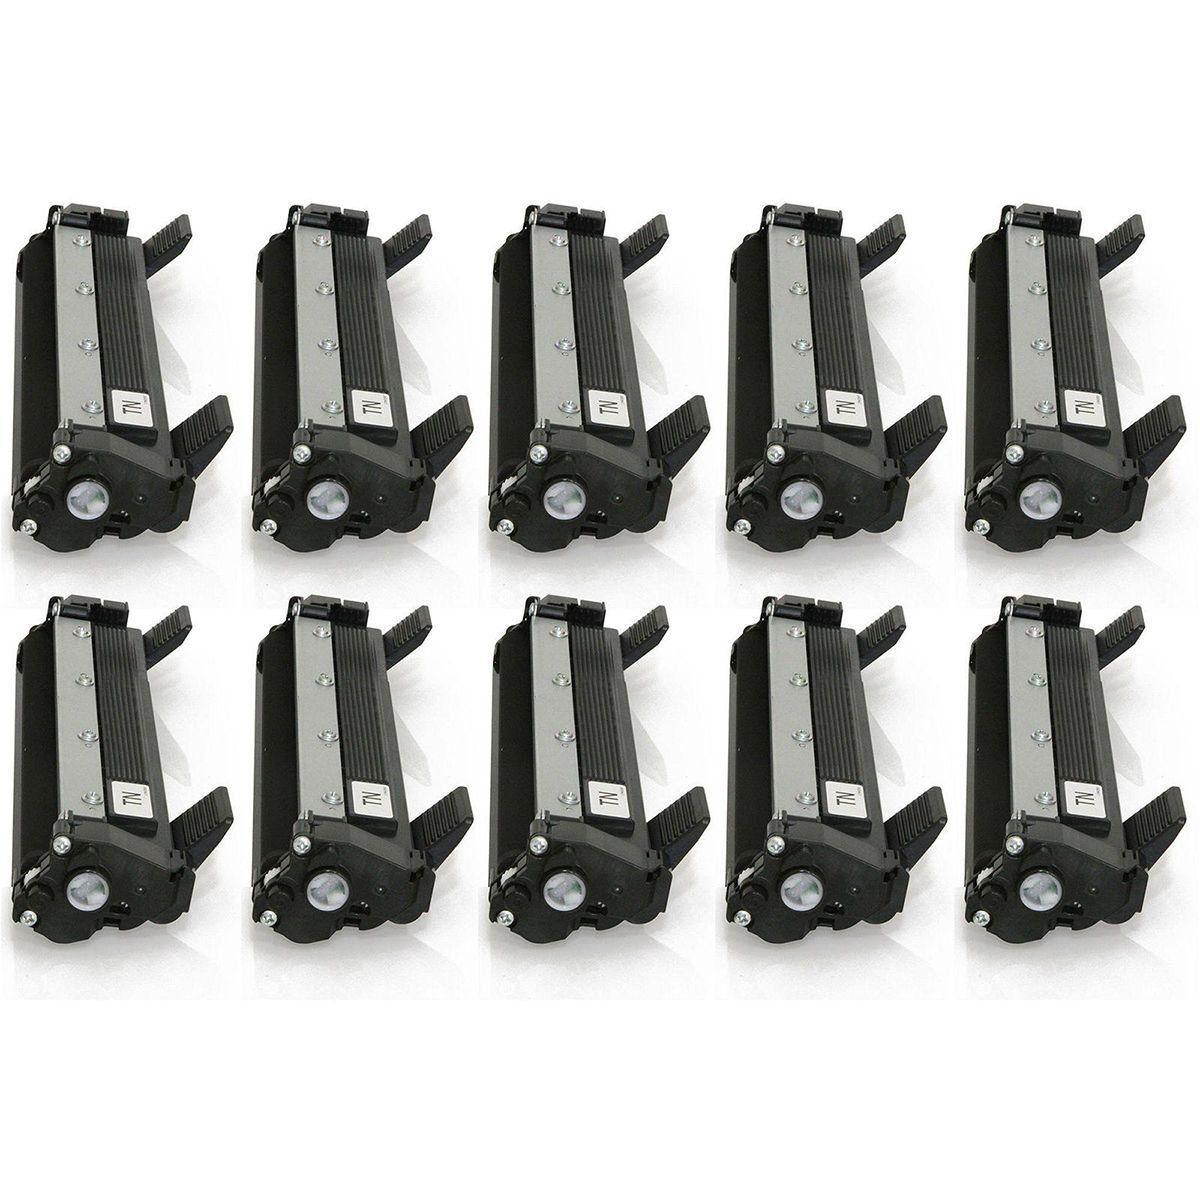 Compatível: Kit 10x Toner TN1060 TN1000 para Brother HL1210w HL1212 DCP1617 HL-1212w DCP-1612w 1617nw / Preto / 1.000